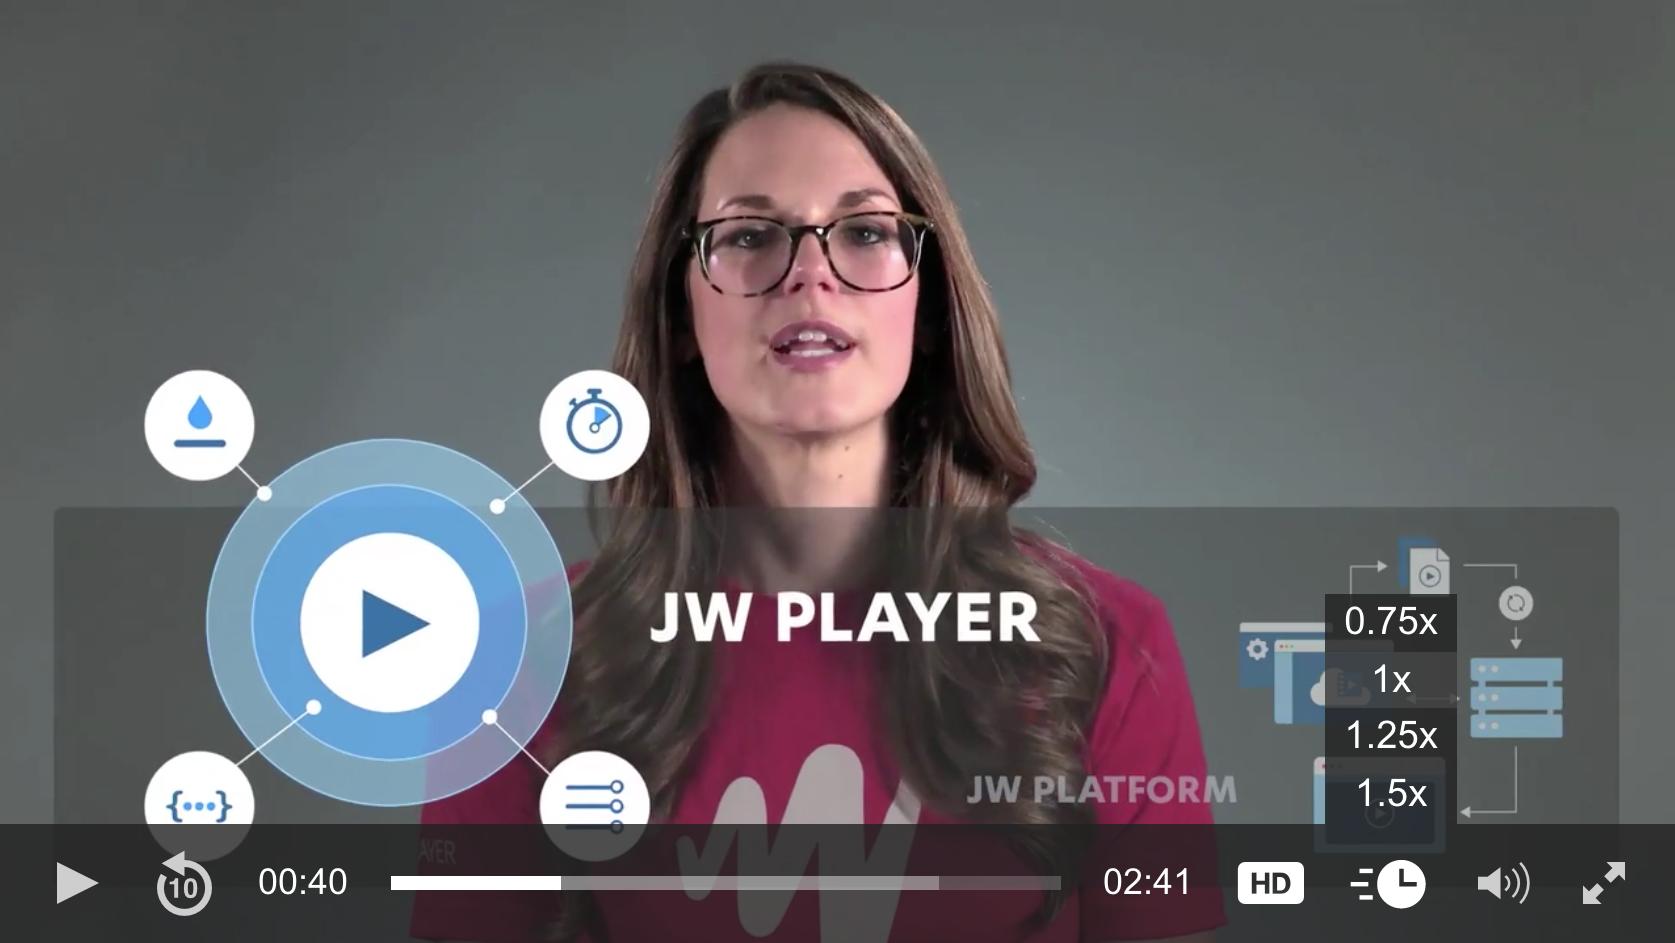 jwplayer playback speed